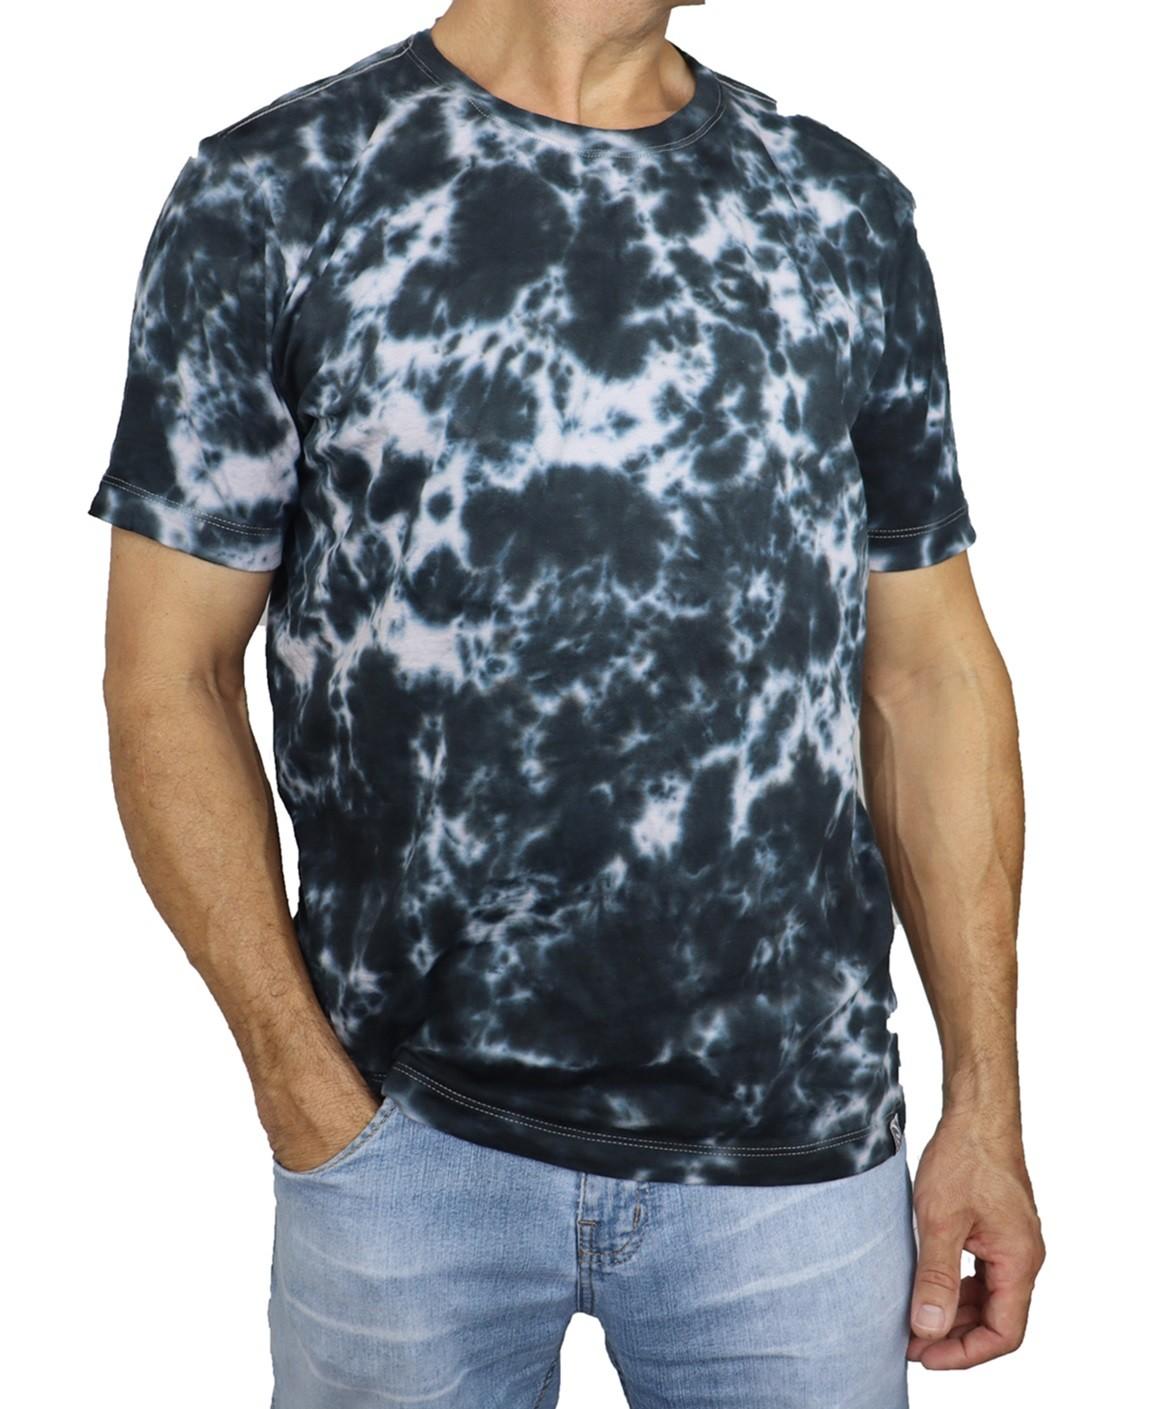 Camiseta Masculina Tie Dye Nuvem  - HF | High Flight